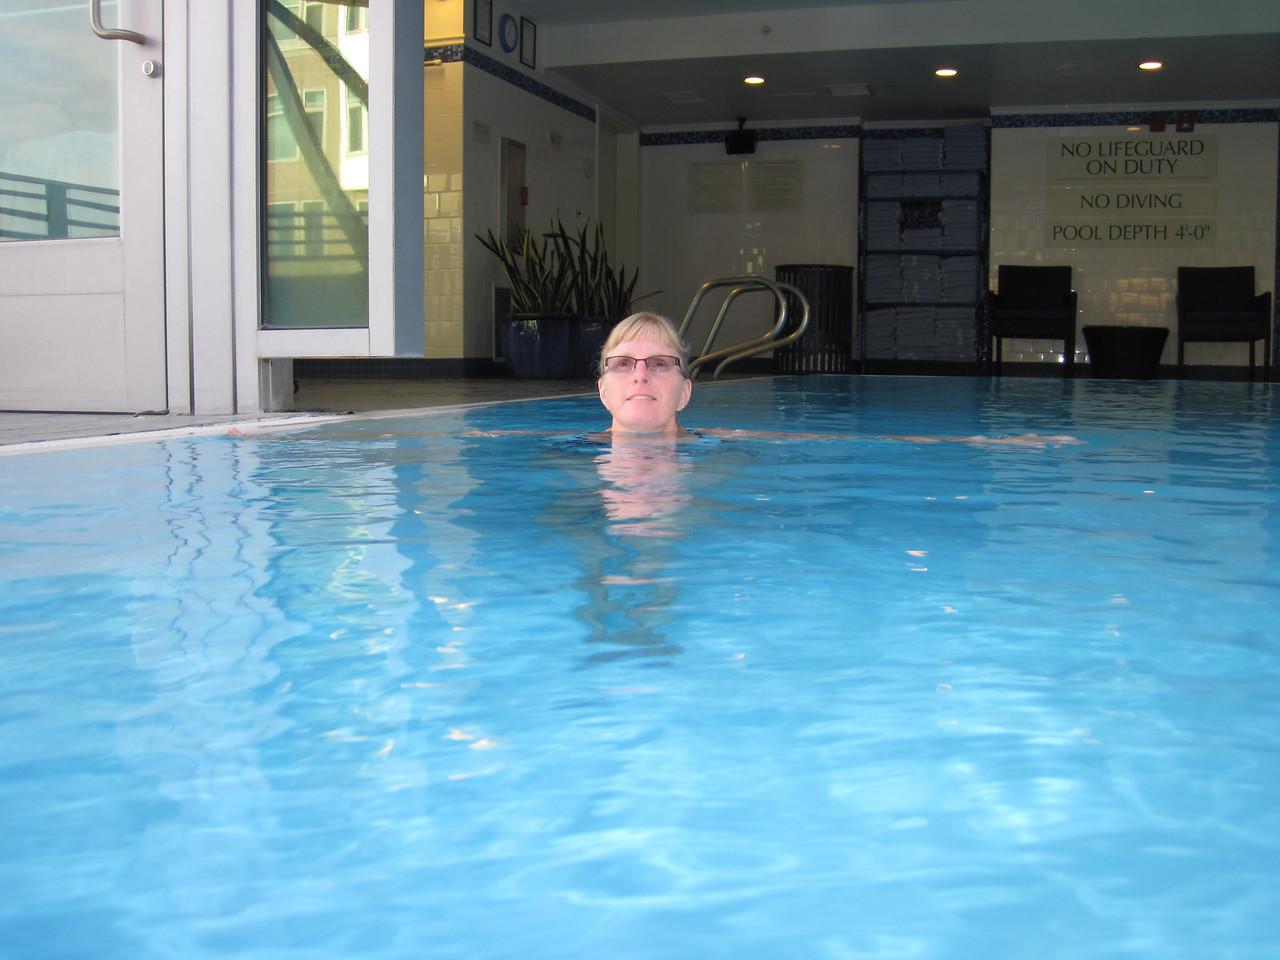 Afternoon Dip in the Pool.